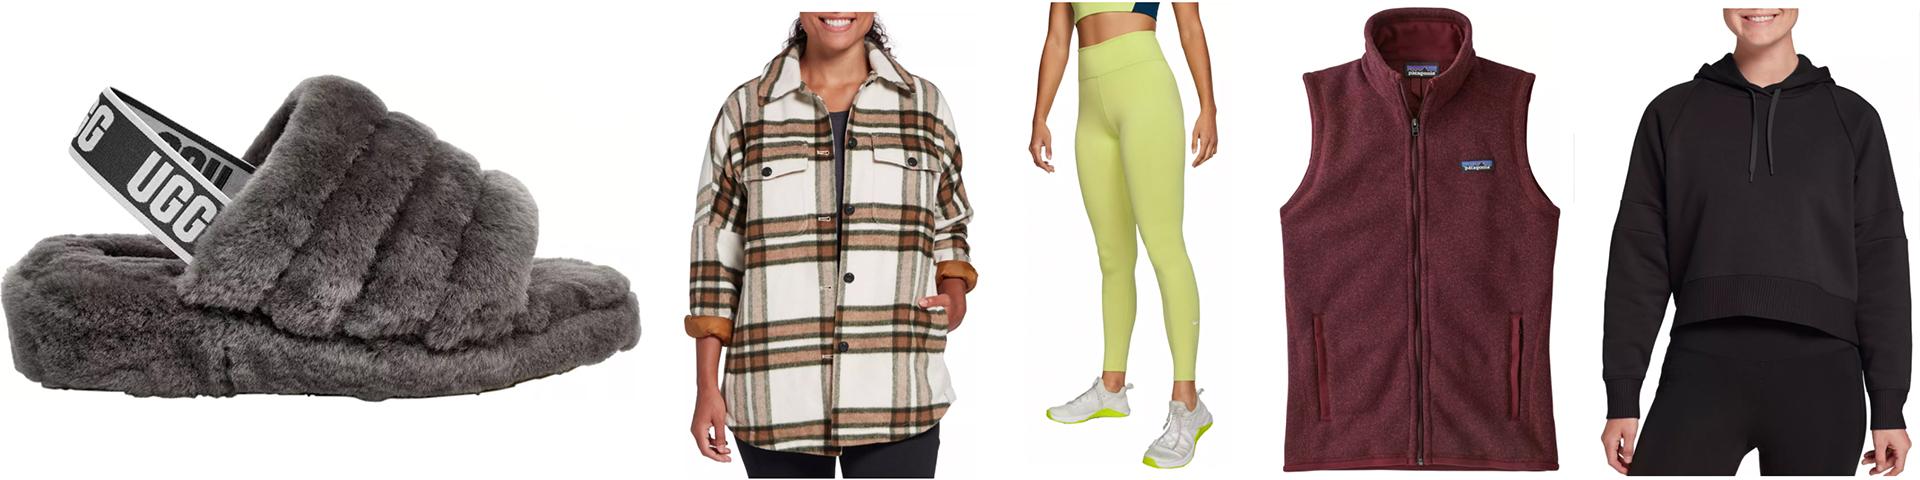 loungewear UGG plaid flannel shacket tights leggings vest sweatshirt